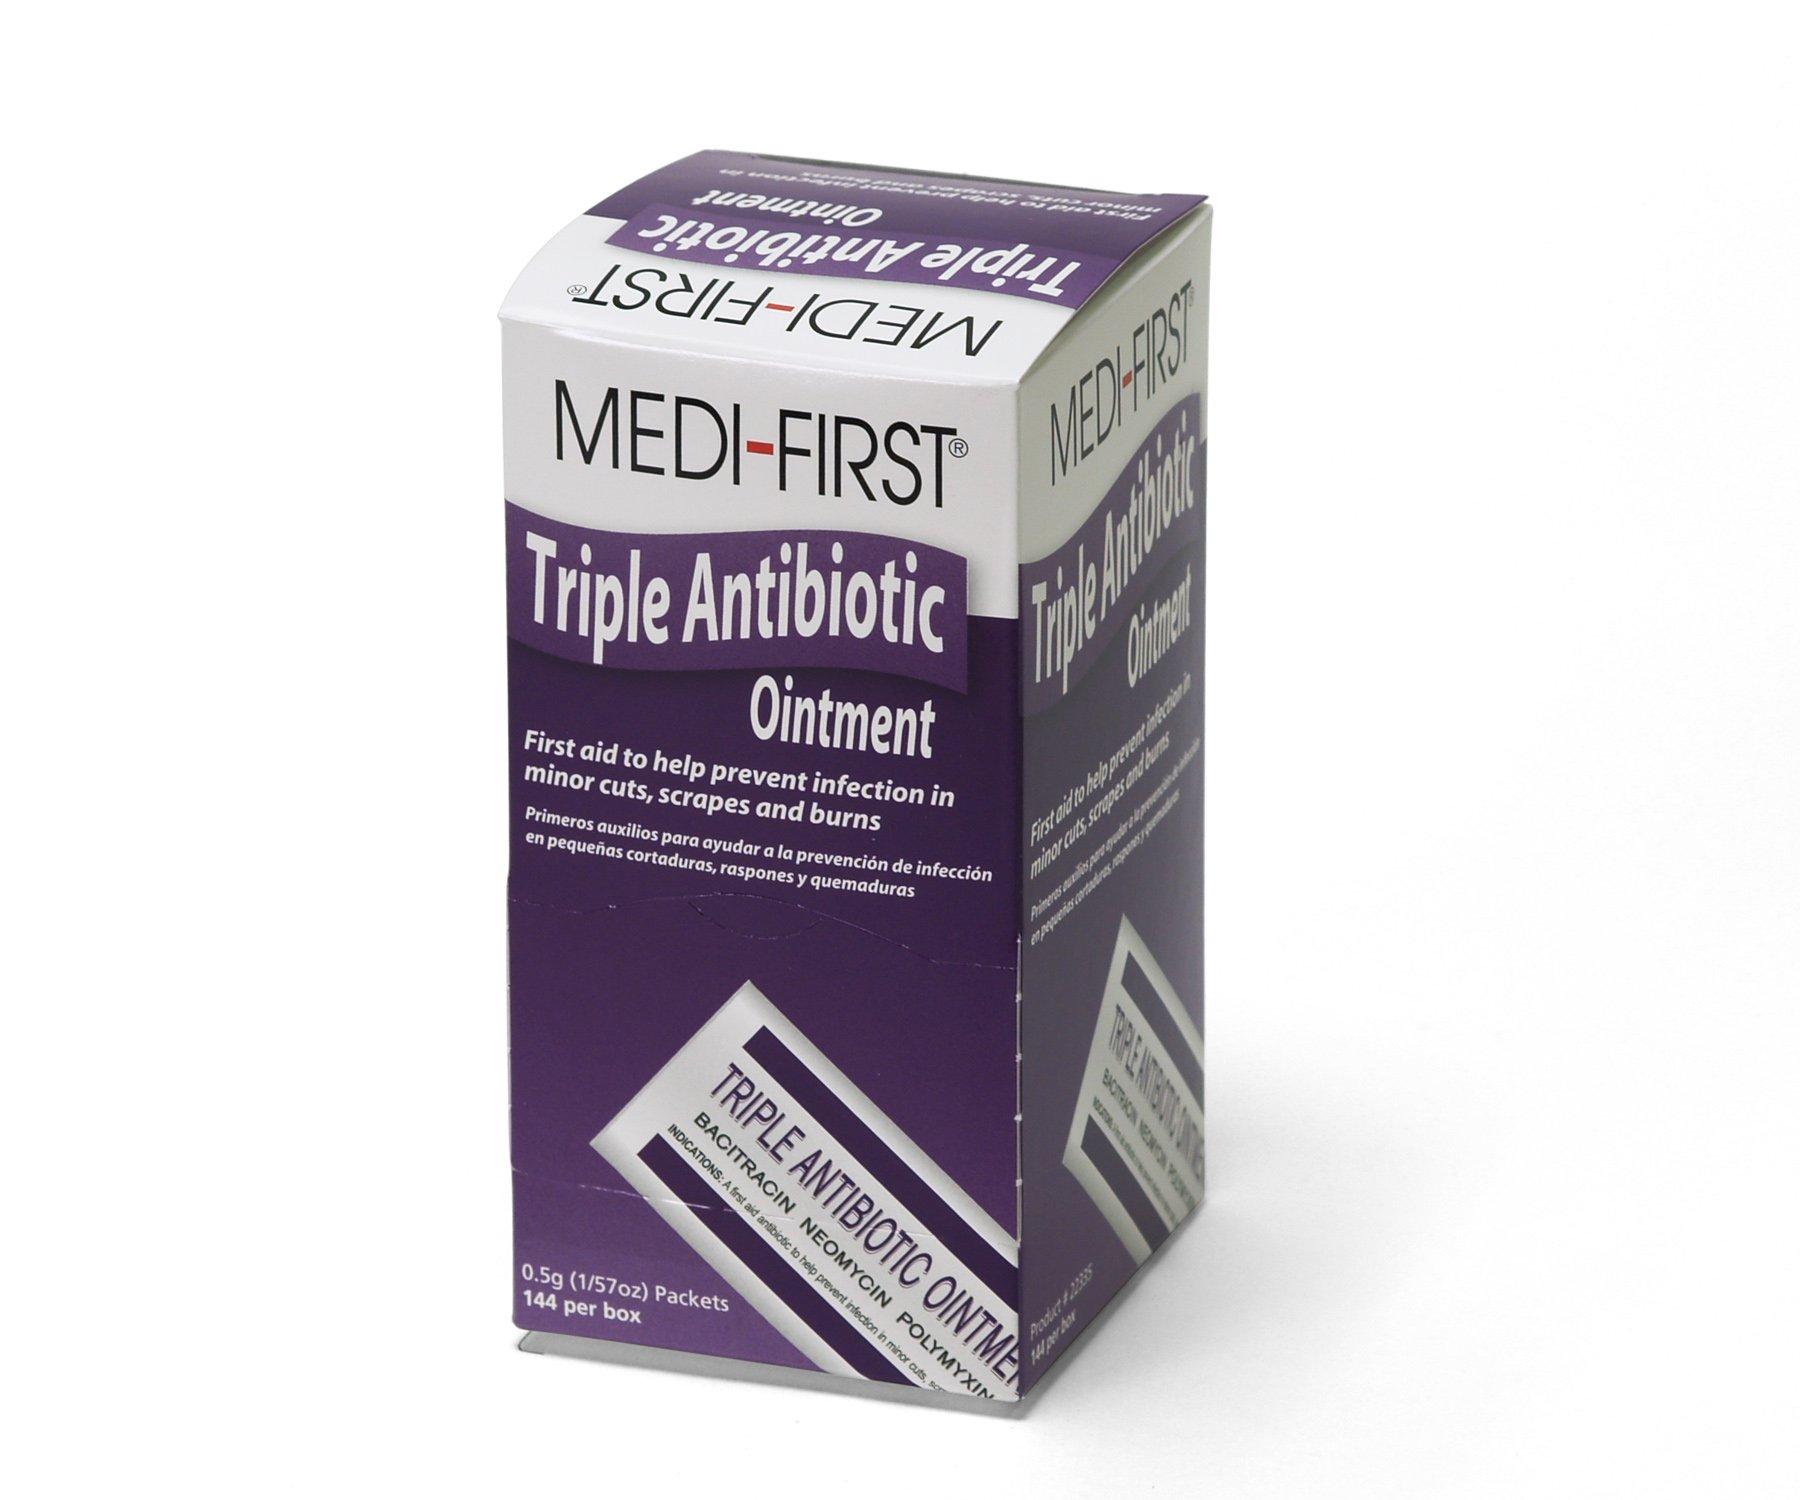 Medique Products 22335 Triple Antibiotic Ointment.5 Gram, 144 Per Box